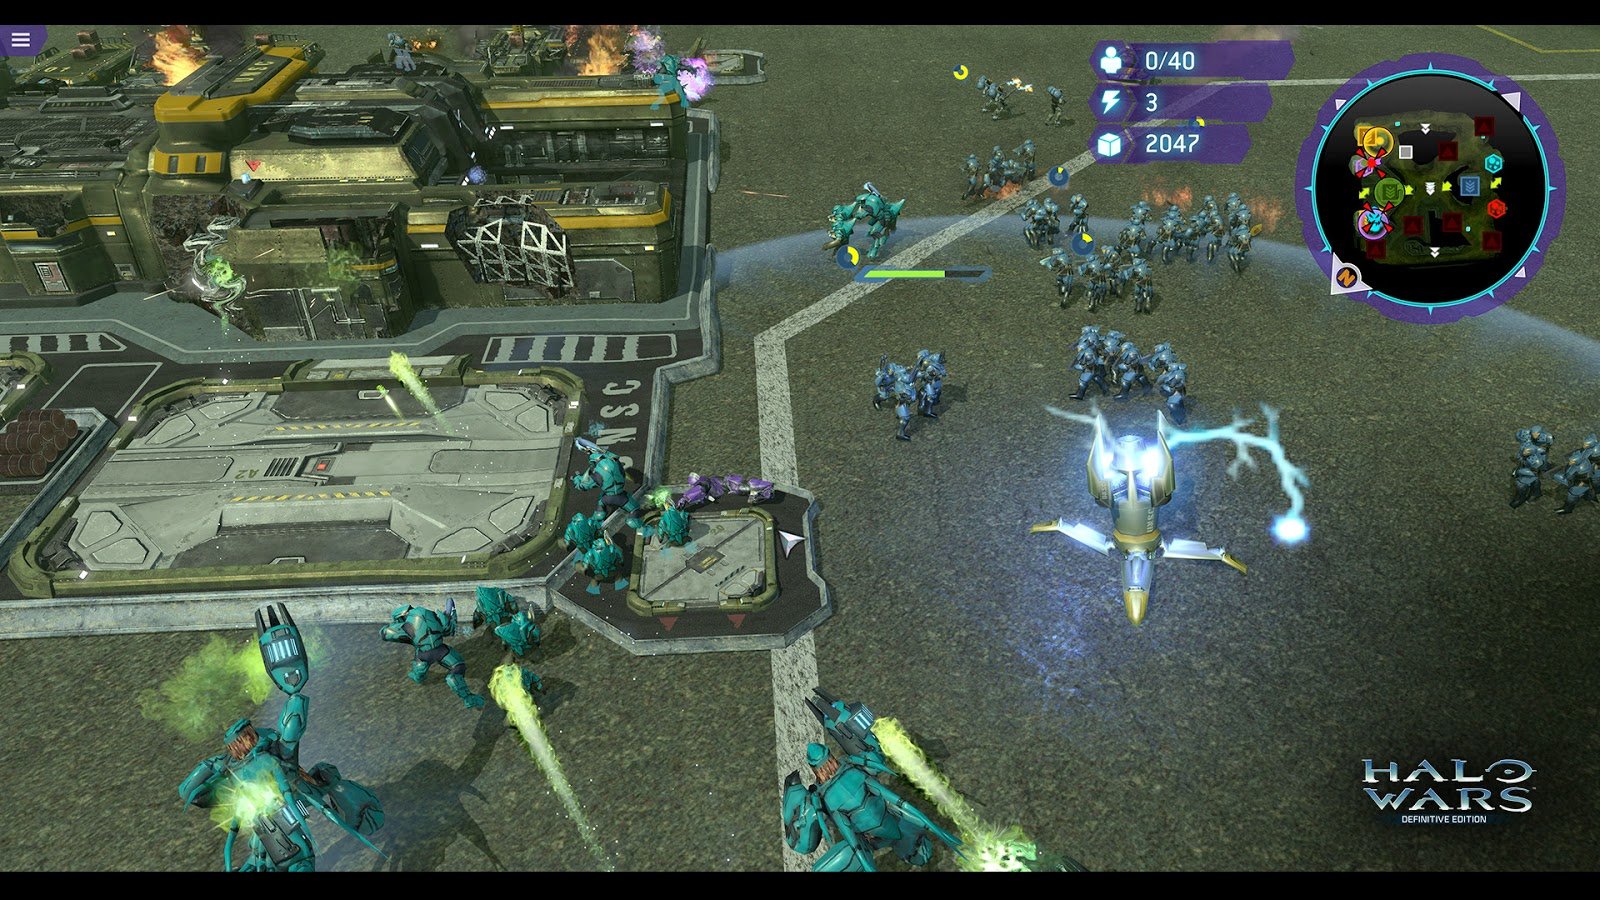 Halo Wars Definitive Edition ESPAÑOL PC Full + Hotfix 2 (CODEX) + REPACK 2 DVD5 (JPW) 7